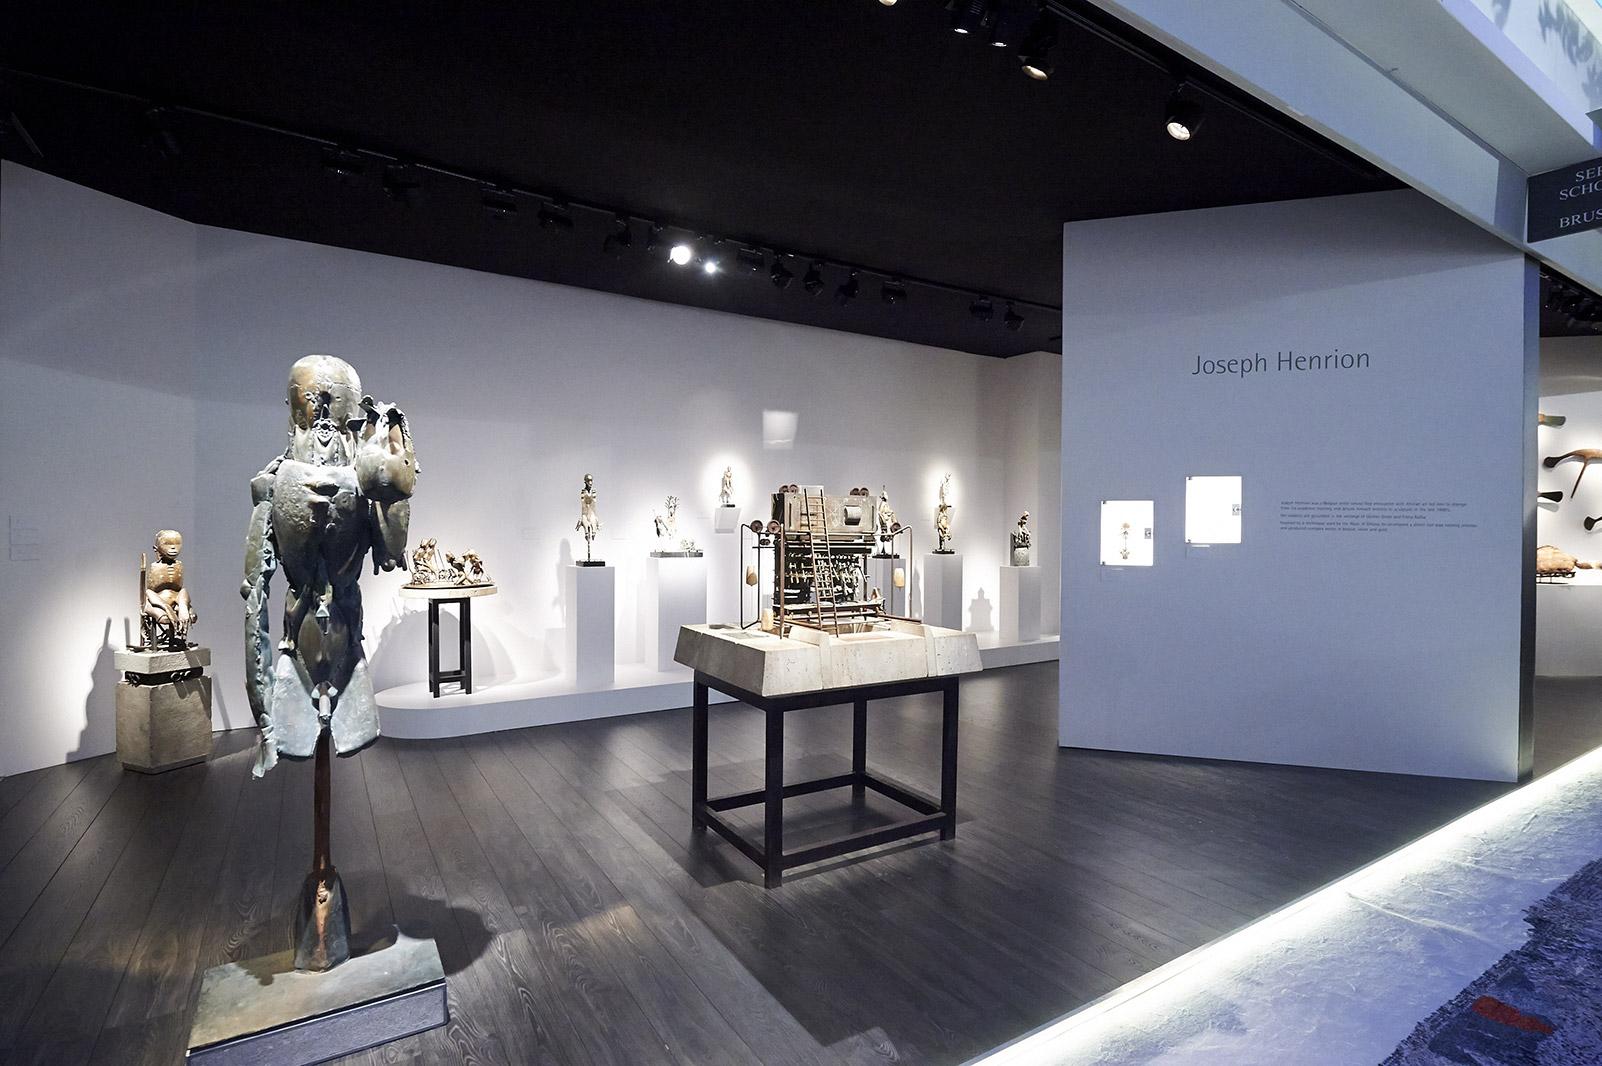 Joseph henrion 1 re partie brafa 2015 v nements for Art premier